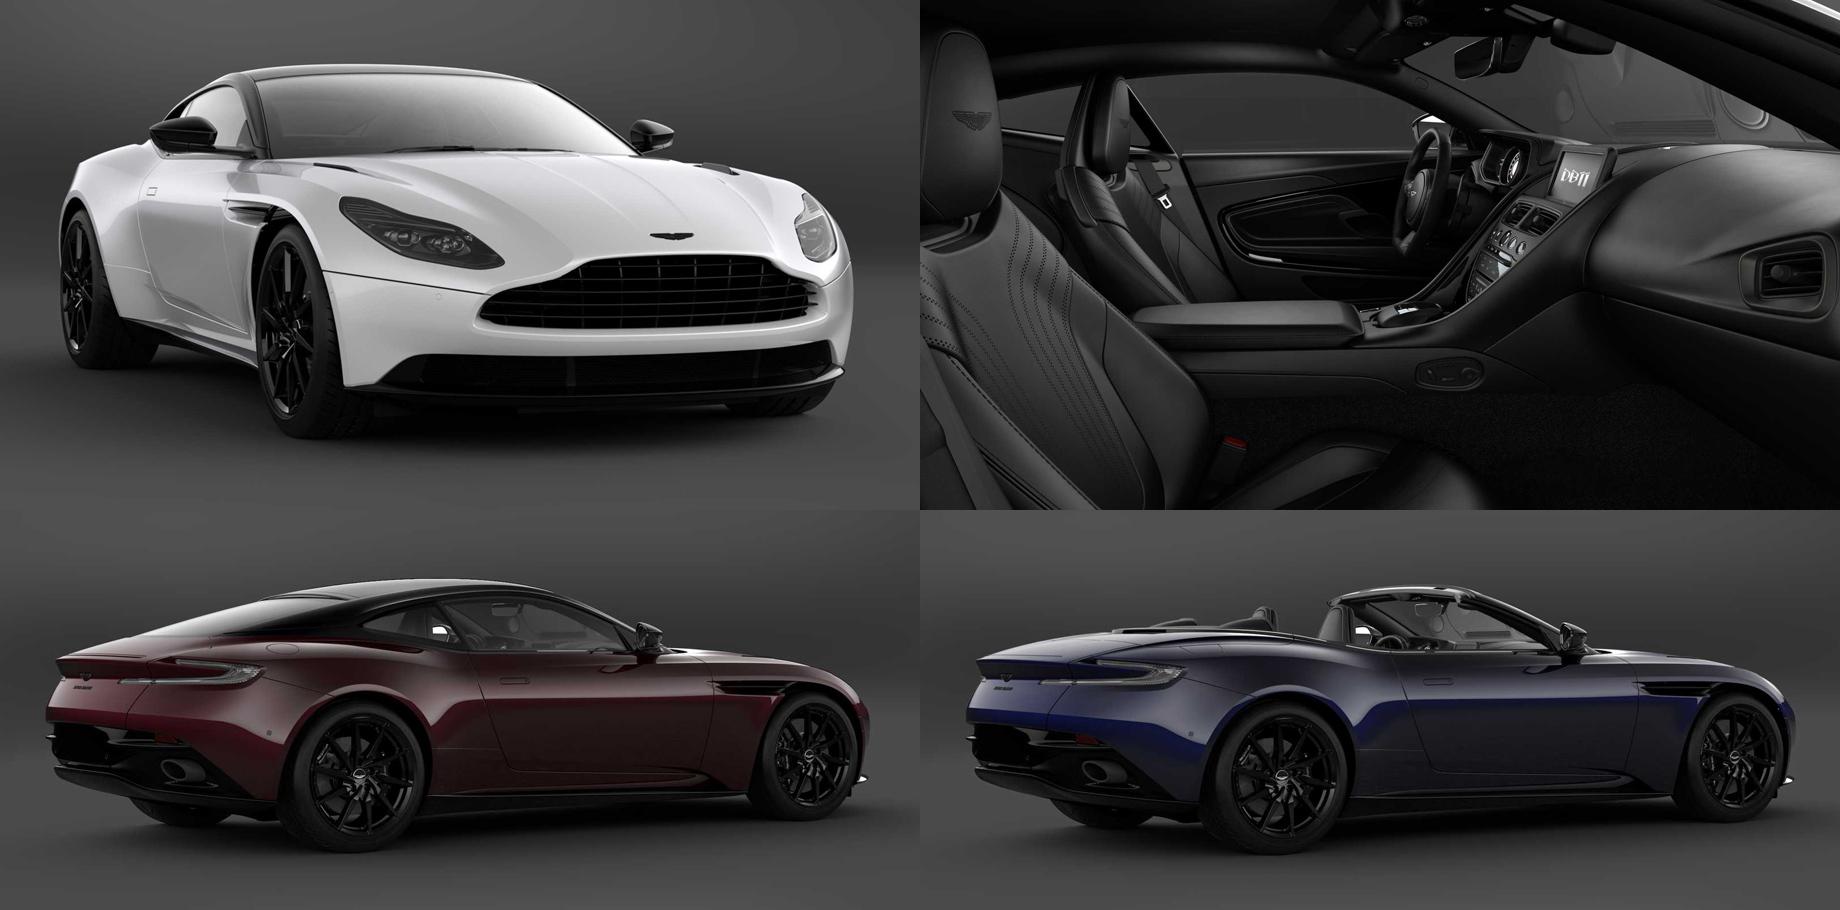 Модель DBX Q by Aston Martin проявила индивидуальность